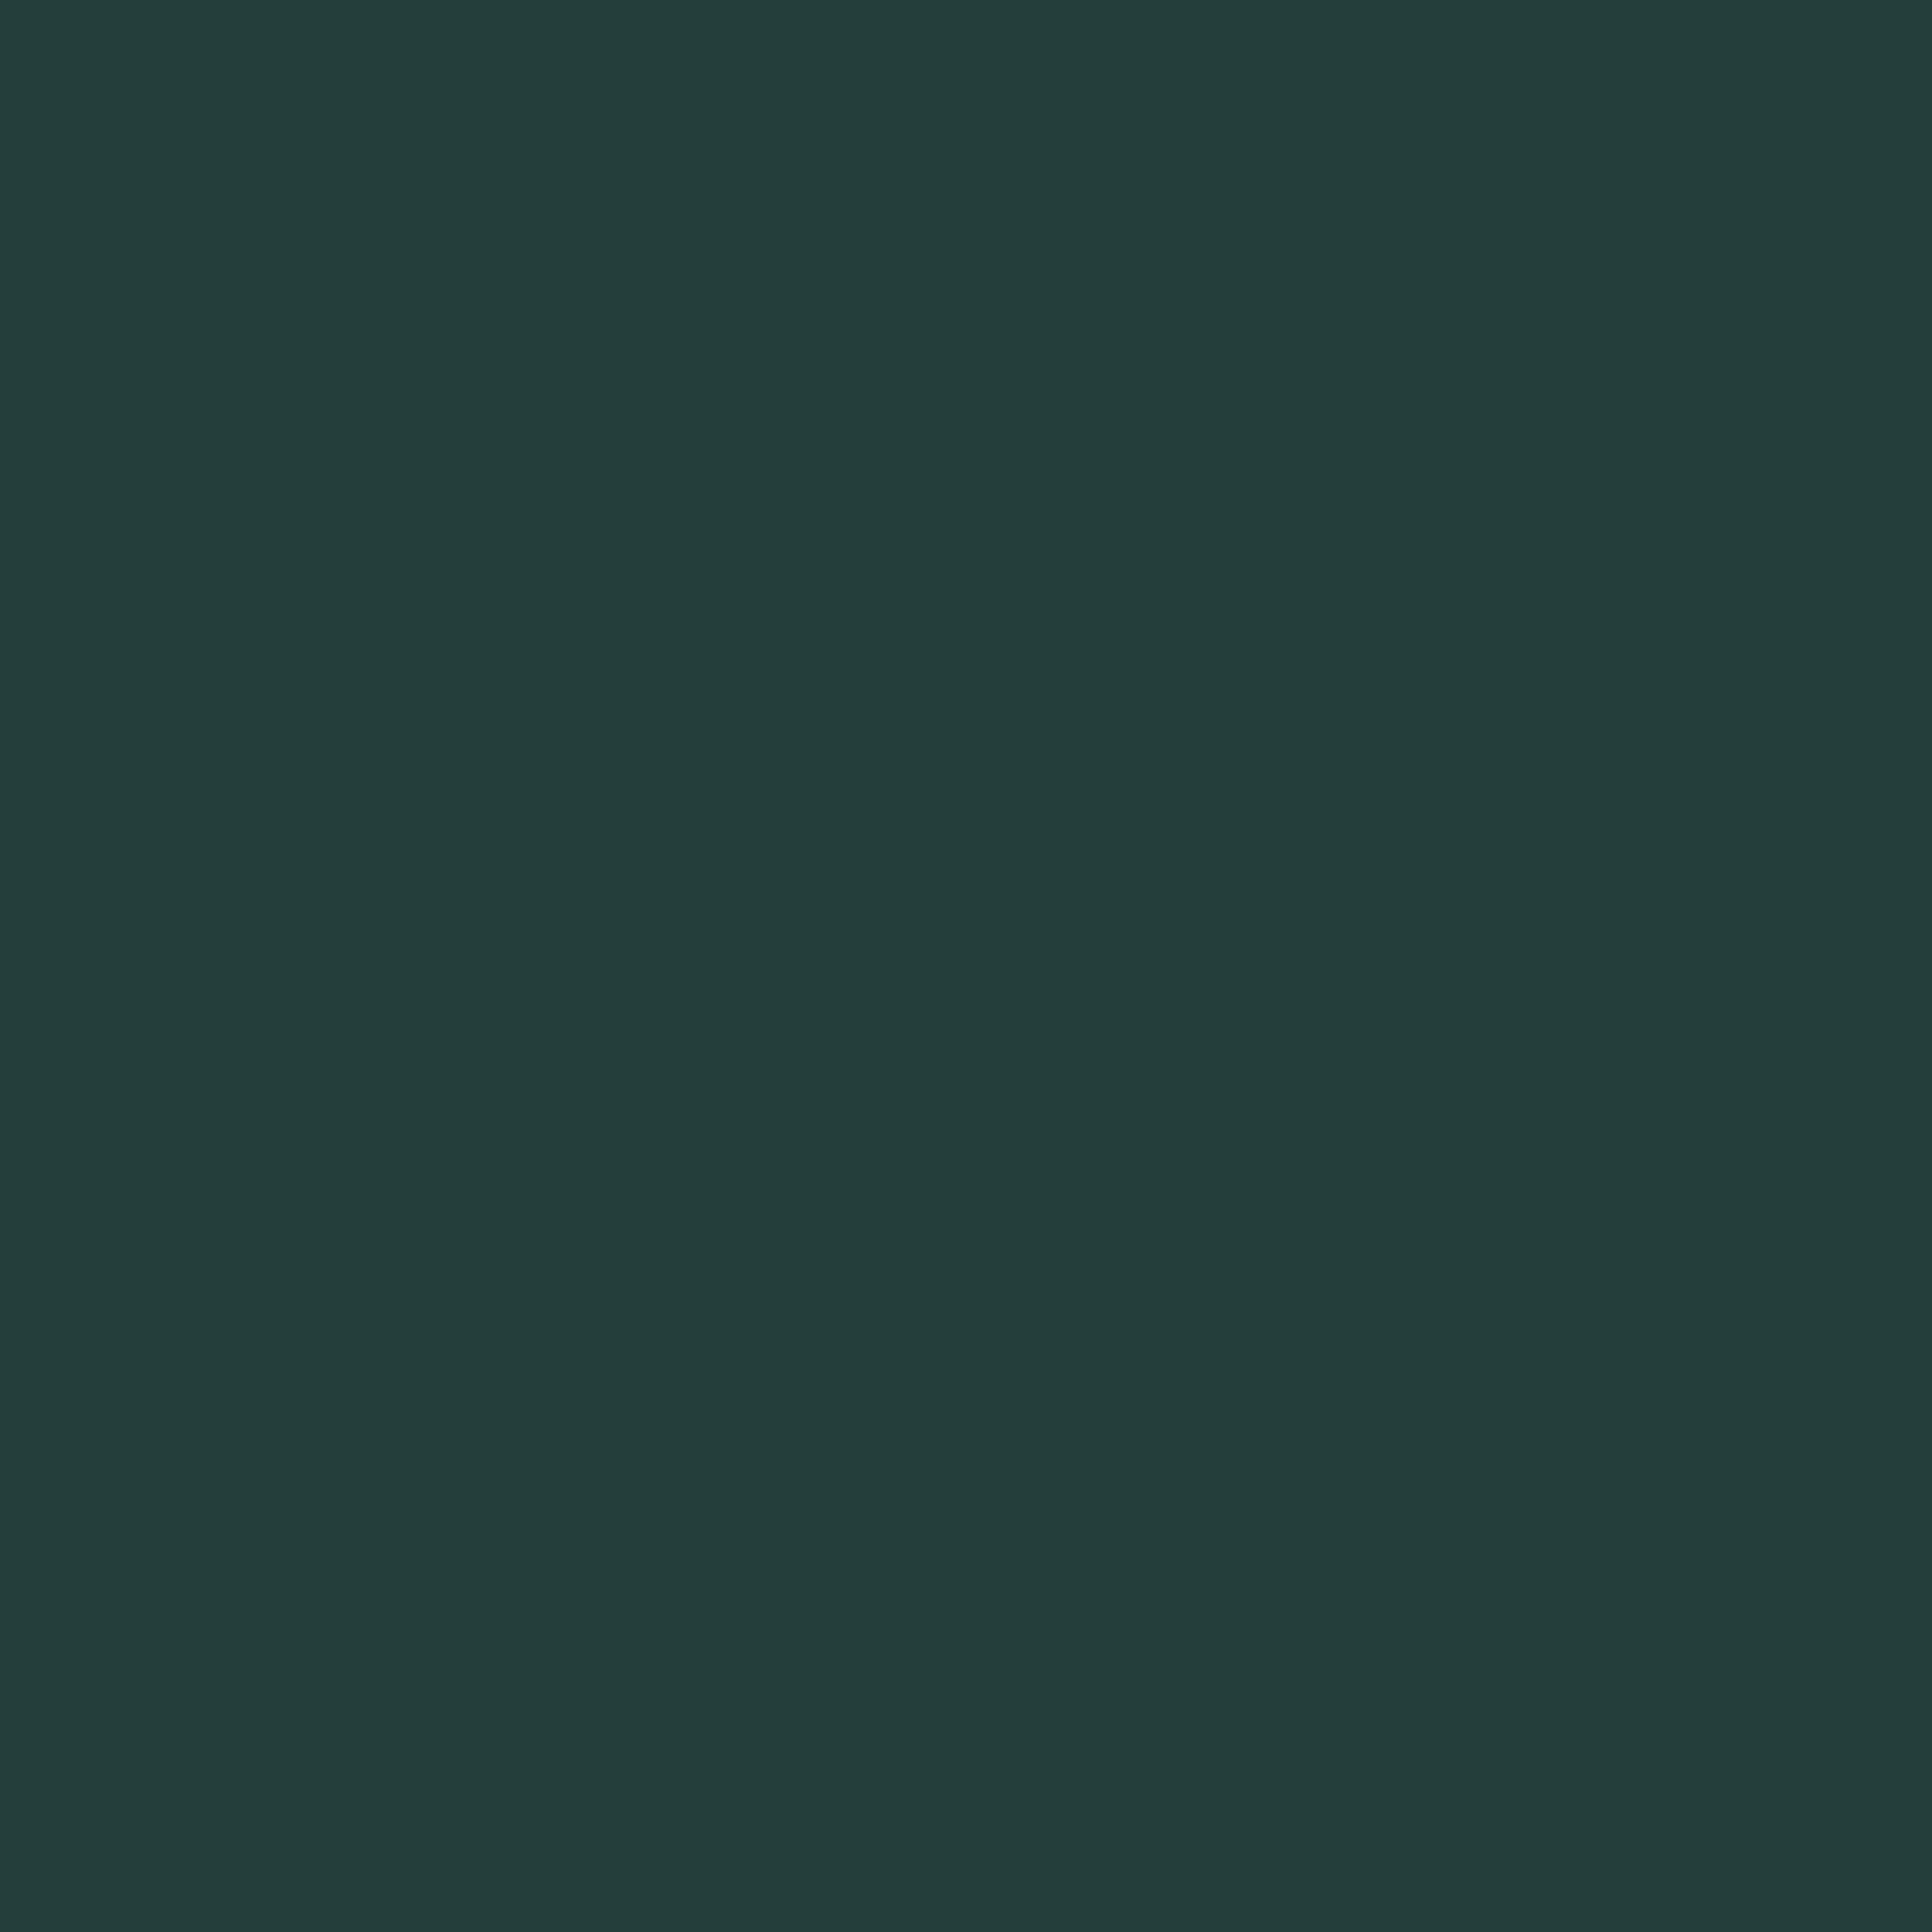 Italeri IT Acrylfarbe 4795 Pz.Schwarzgr.RA 20 ml Airbrush Farbe